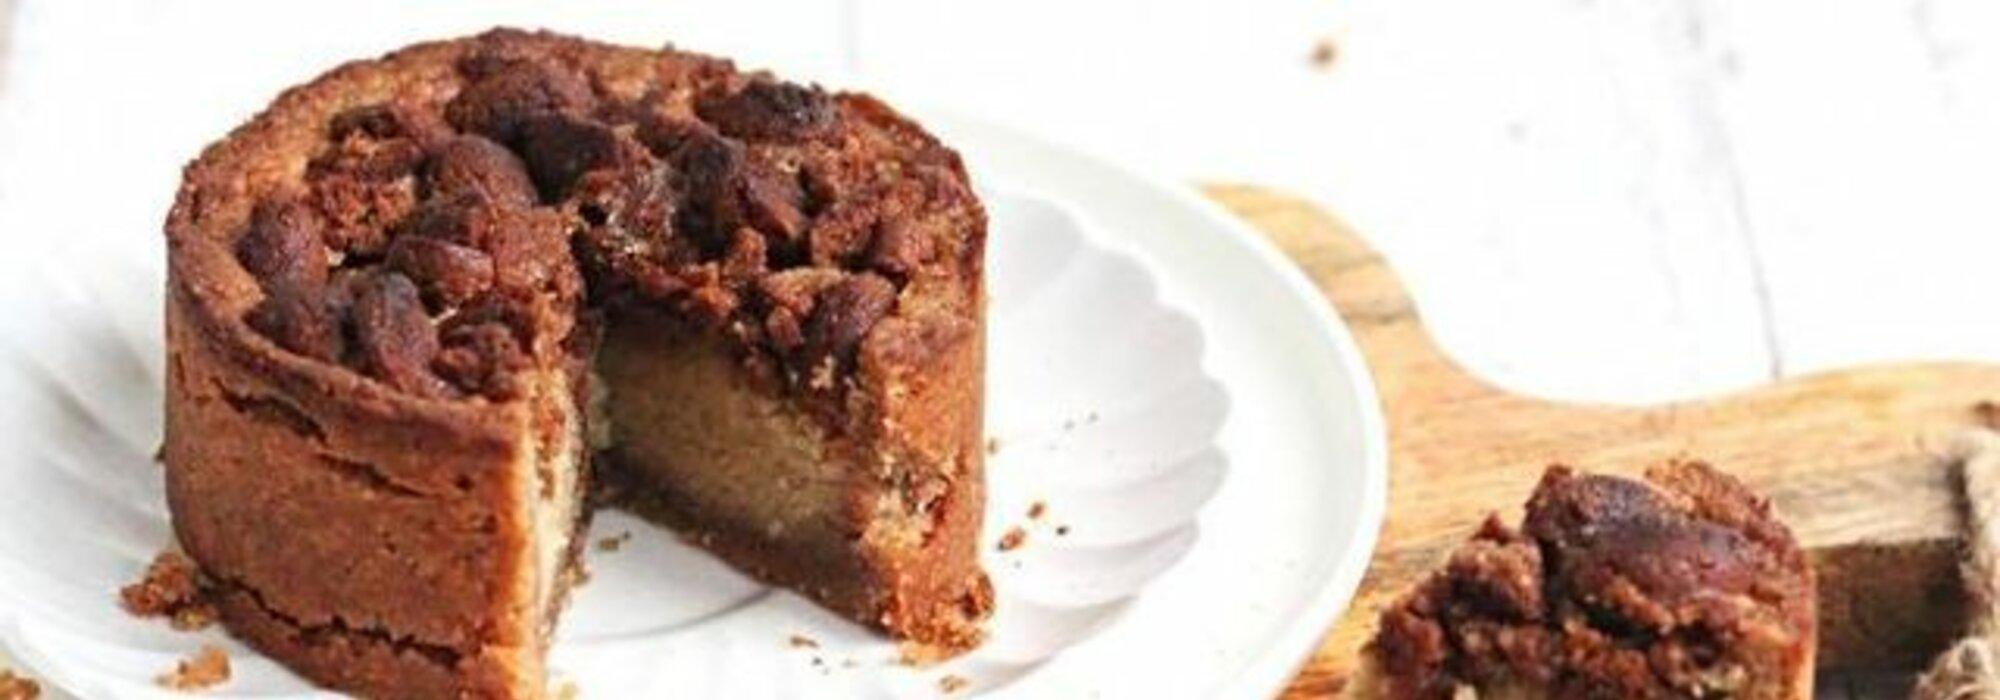 Koolhydraatarm kruidnoten crumble taartje